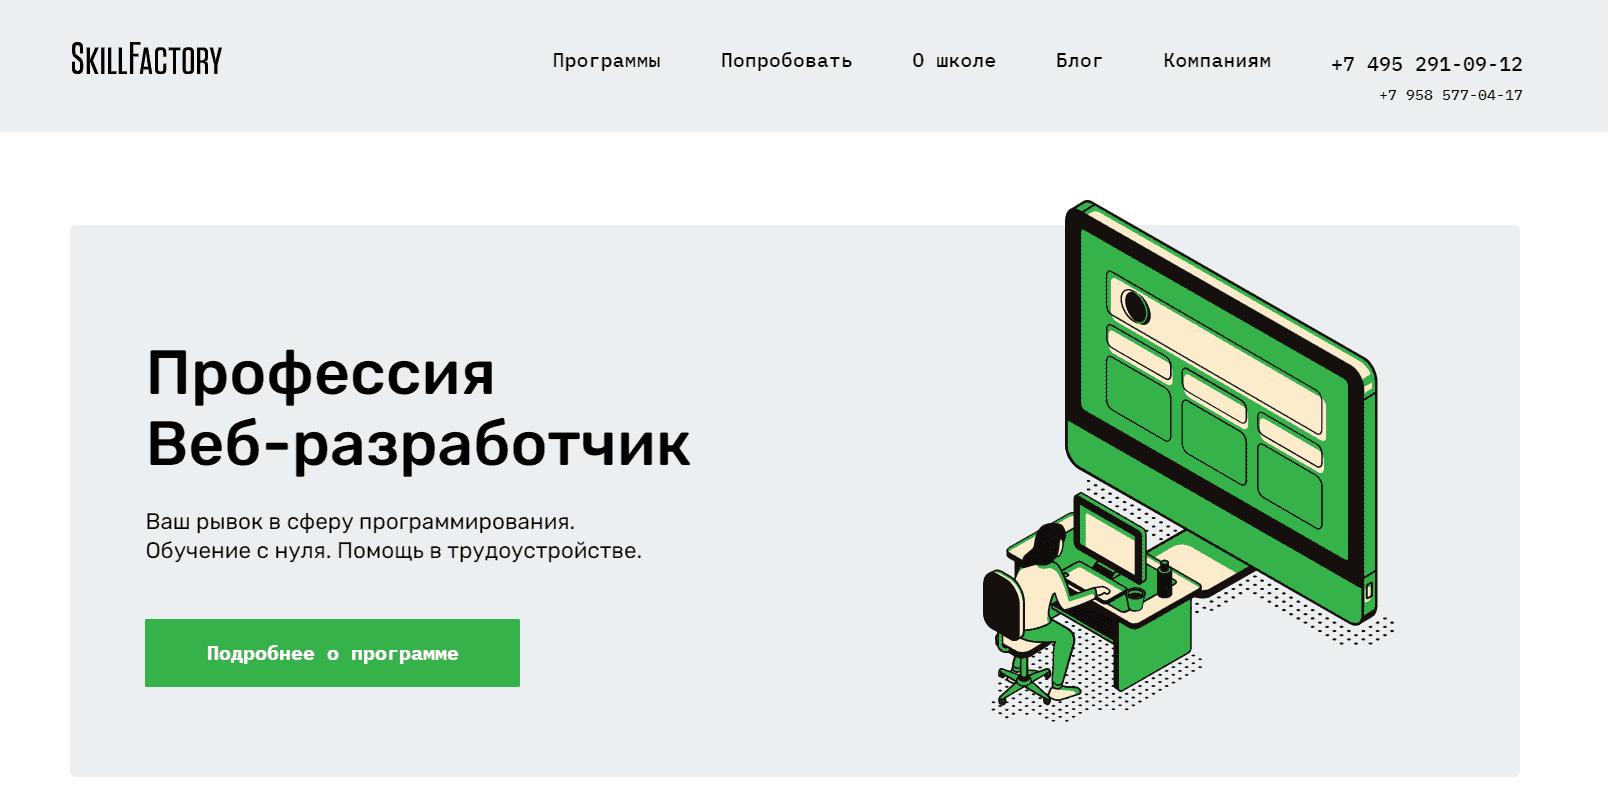 Профессия Веб-разработчик от SkillFactory